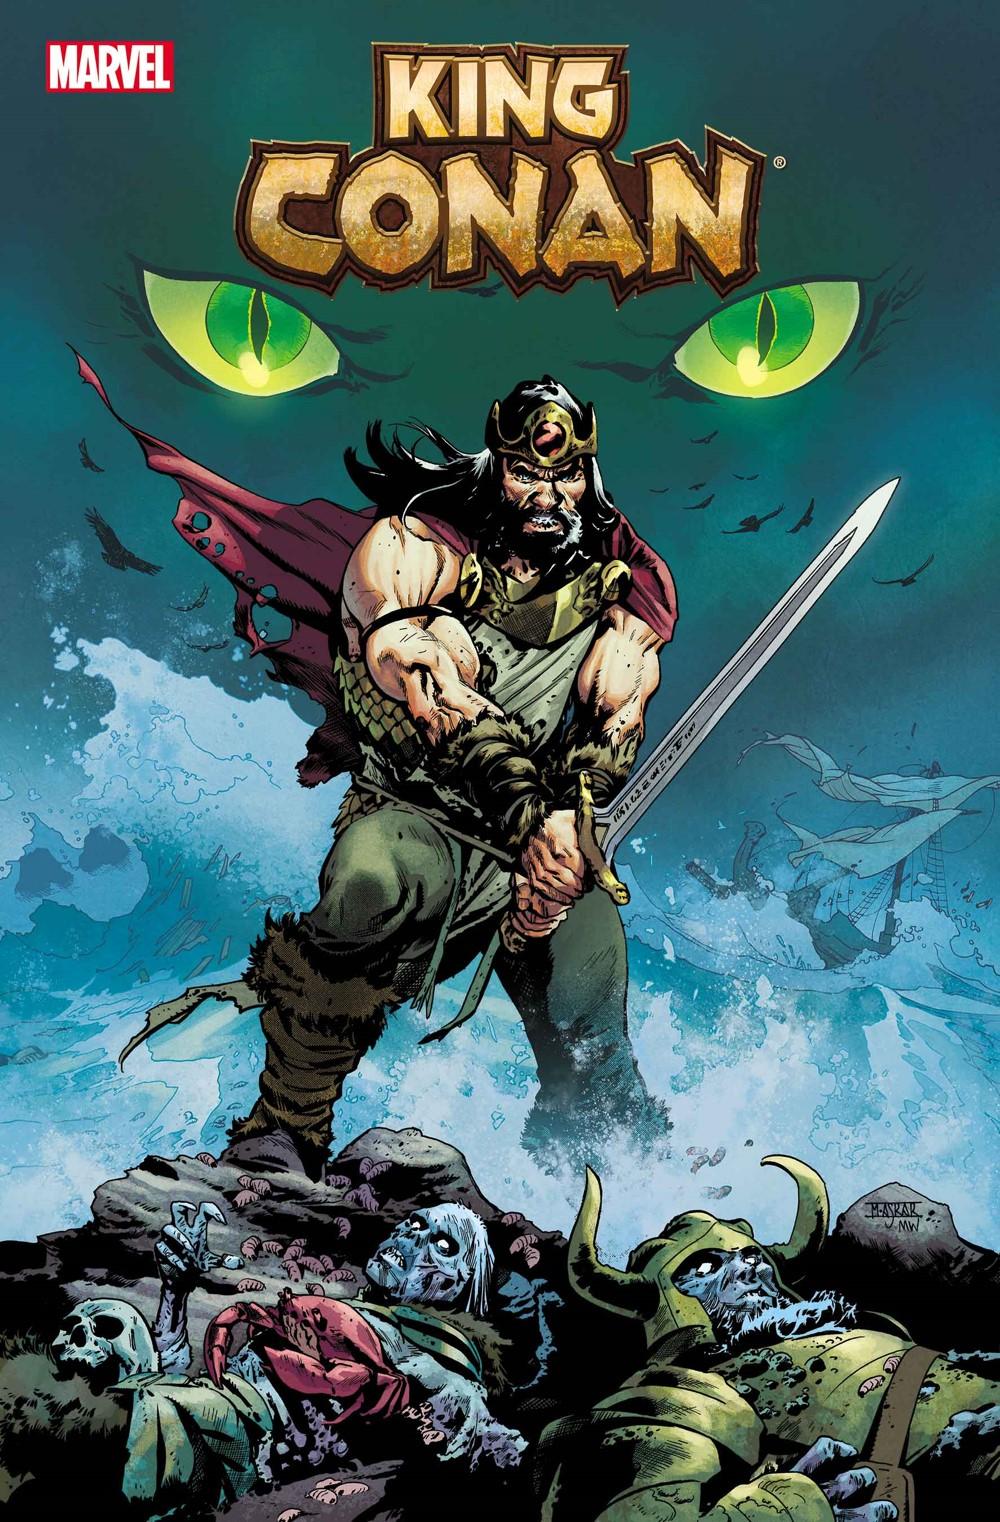 KINGCONAN2021001_Mahmud-1 Marvel Comics December 2021 Solicitations